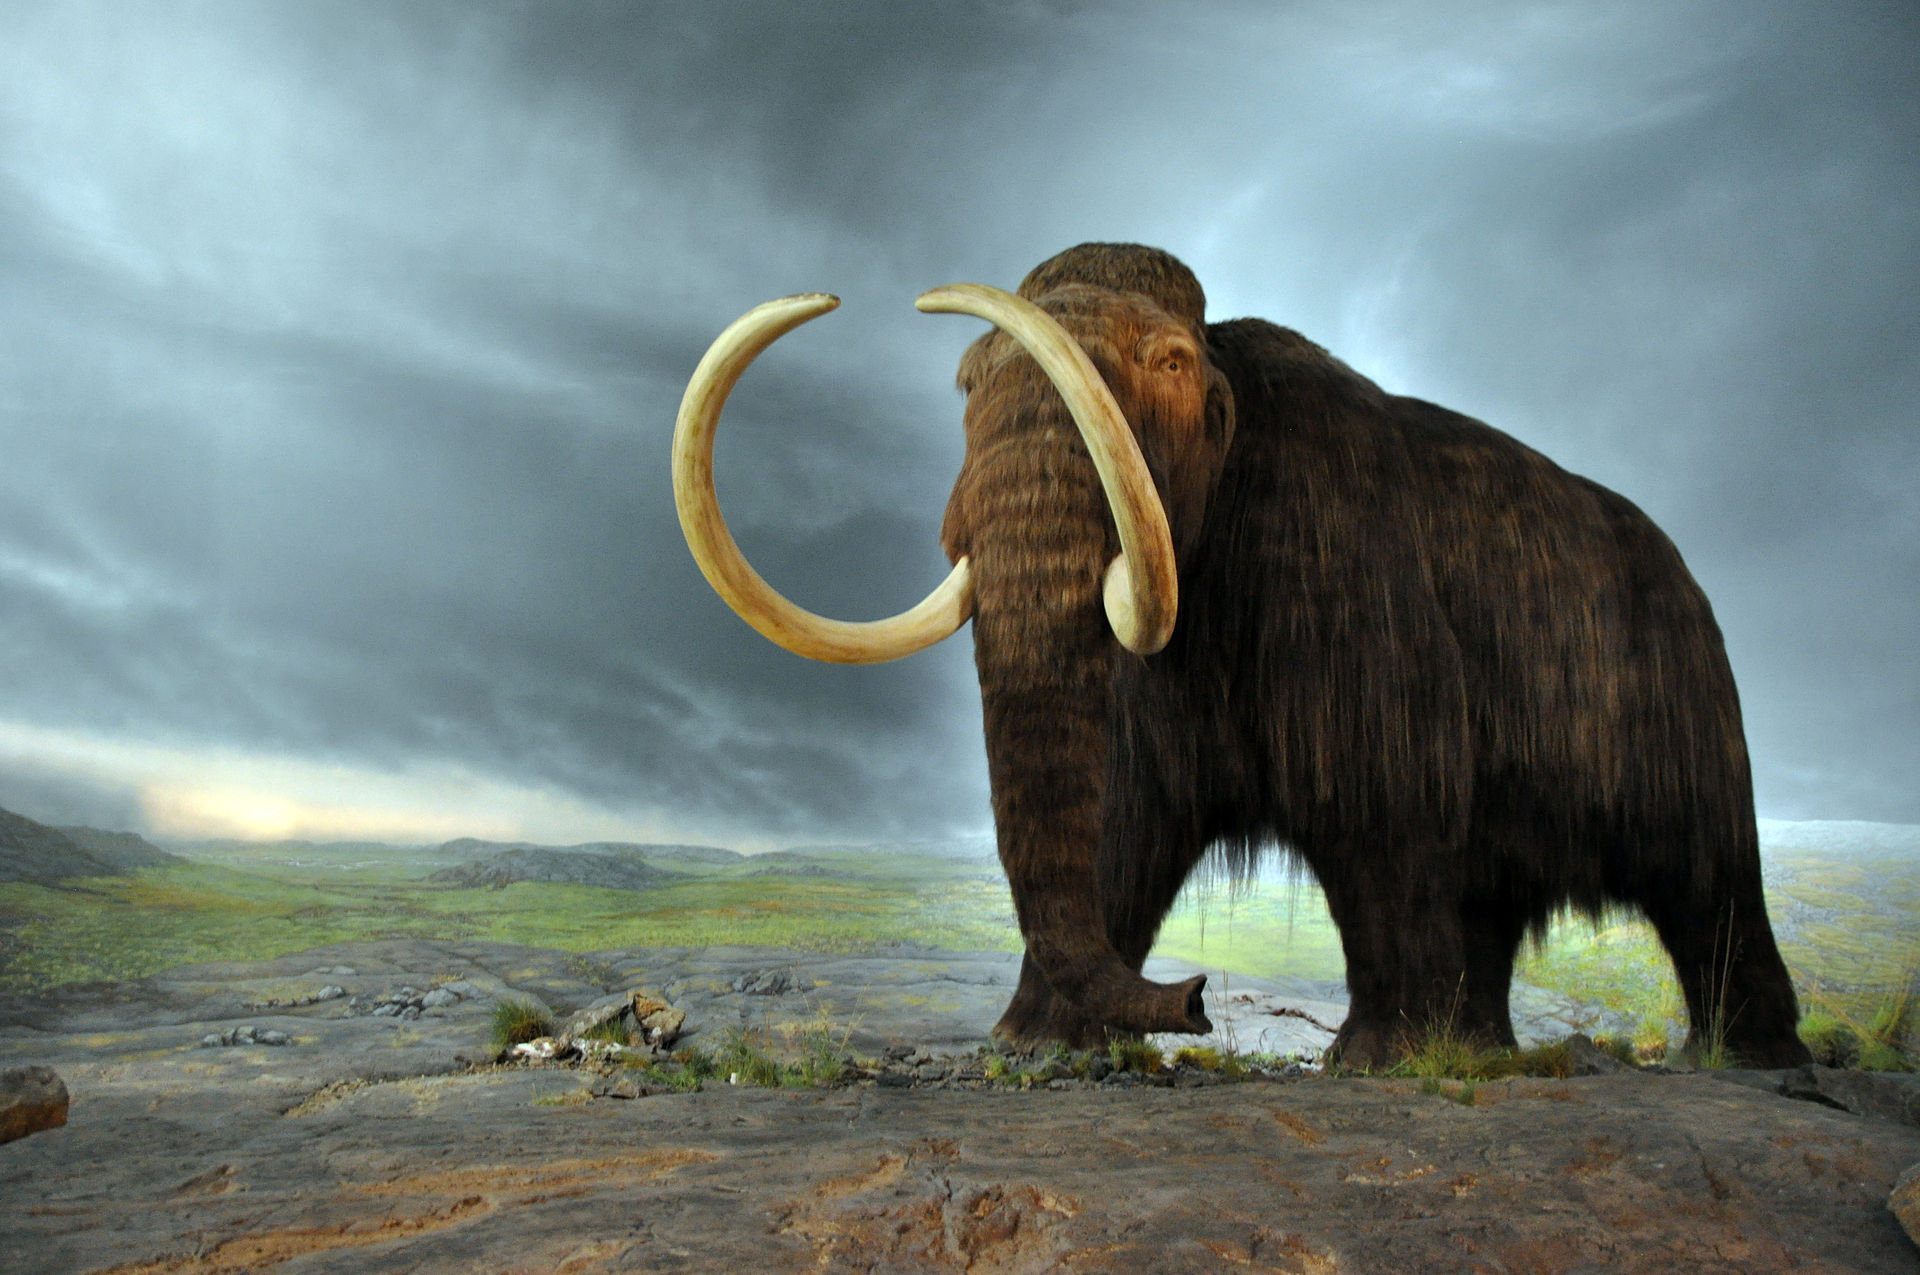 Woolly mammoth - By Mammut - CC BY-SA 2.0